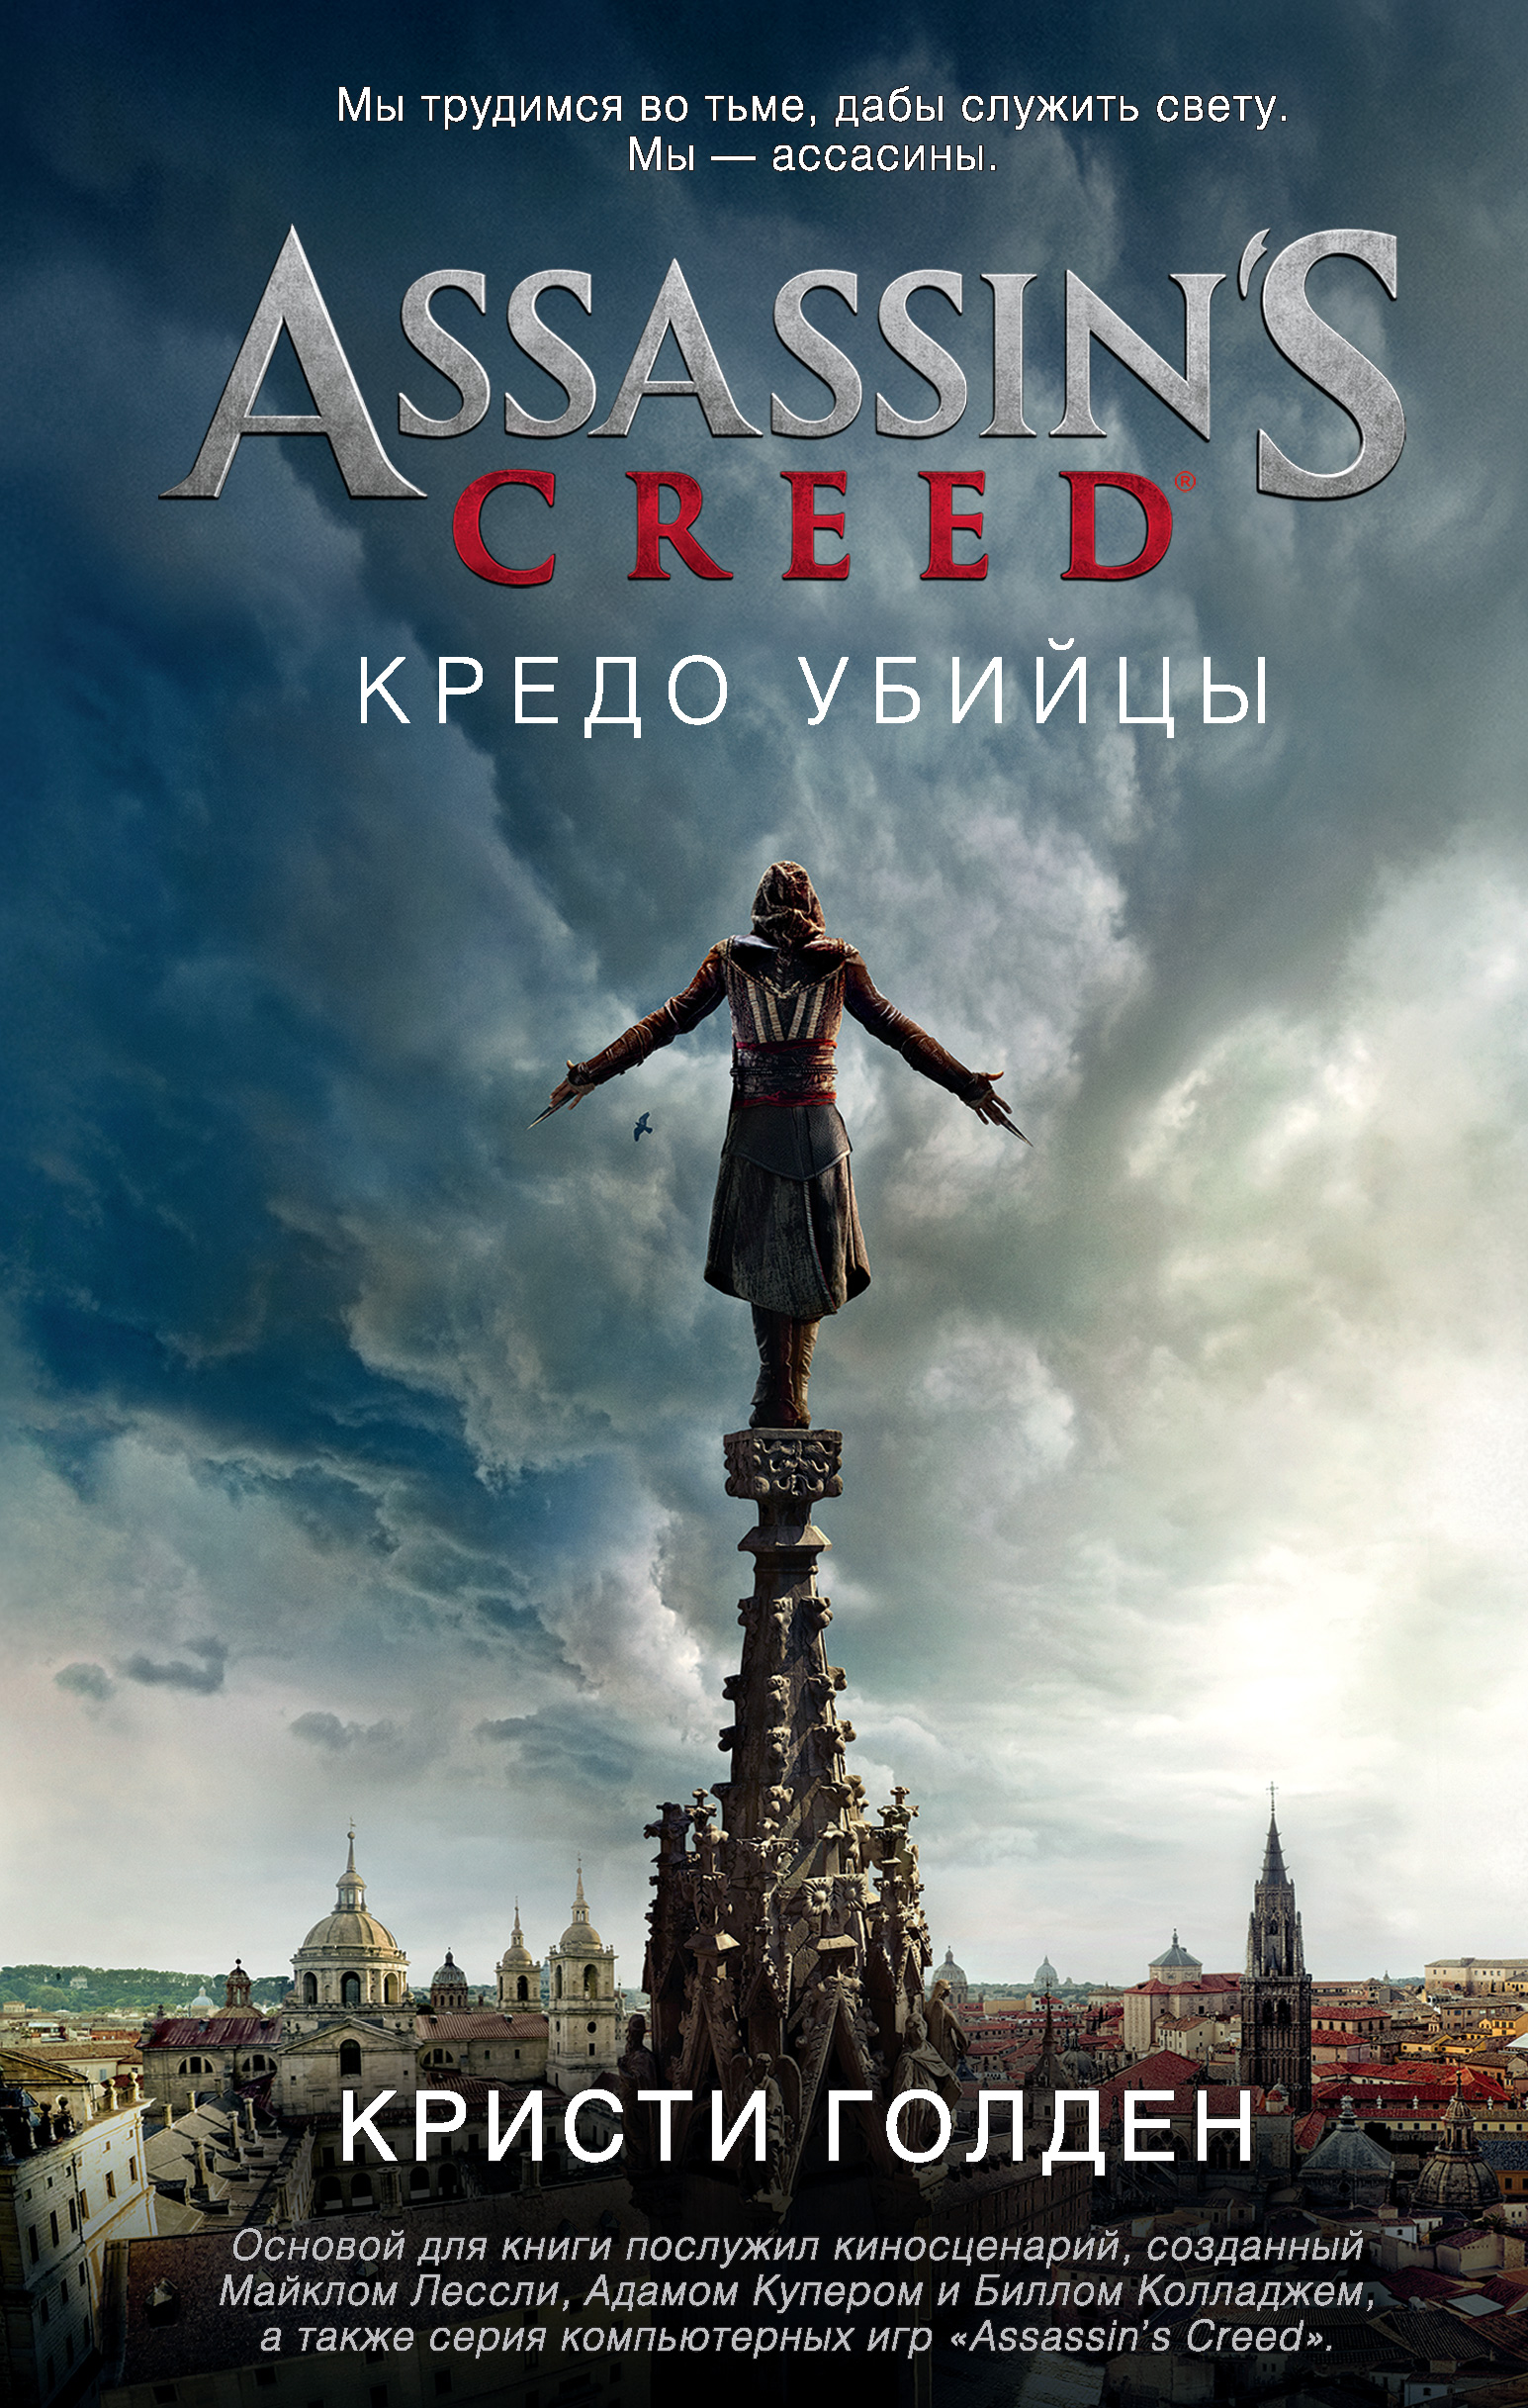 Кристи Голден Assassin's Creed. Кредо убийцы майка print bar кредо убийцы агилар де нерха